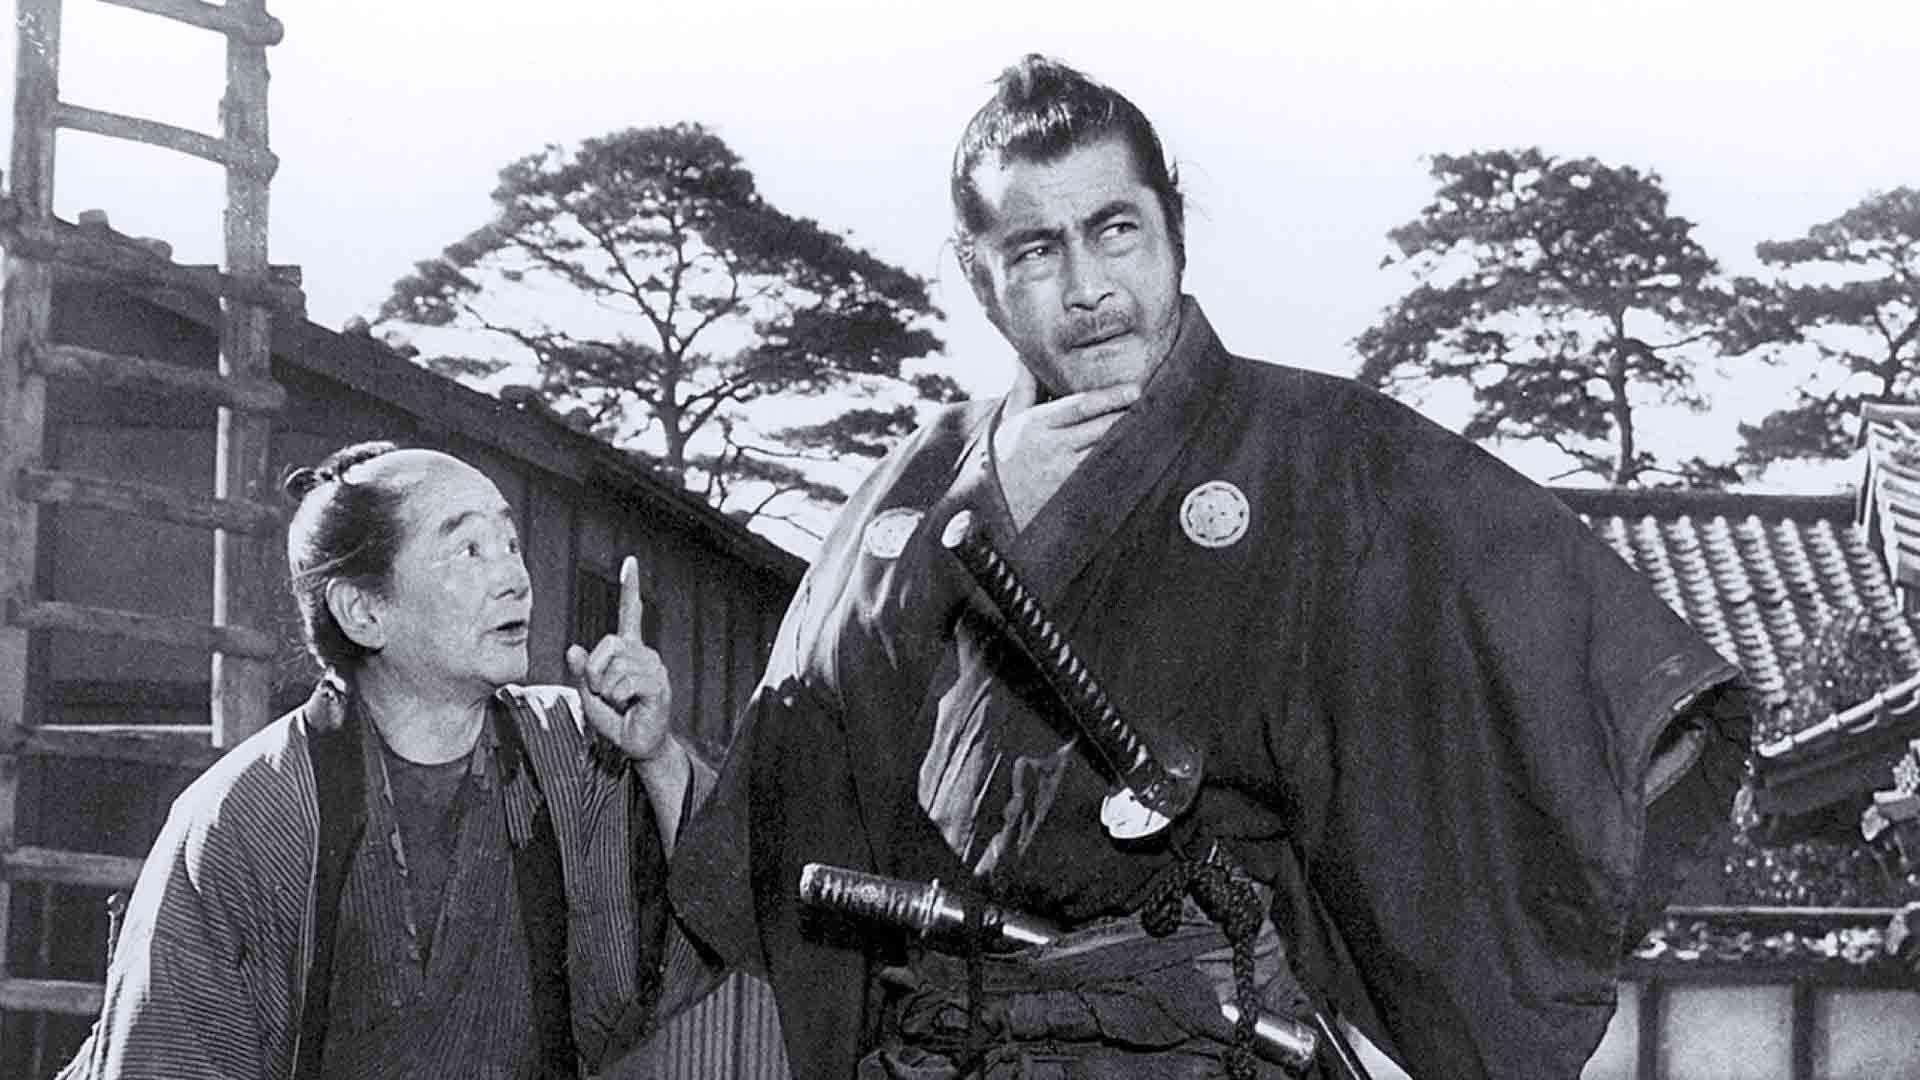 Yojinbo di Akira Kurosawa